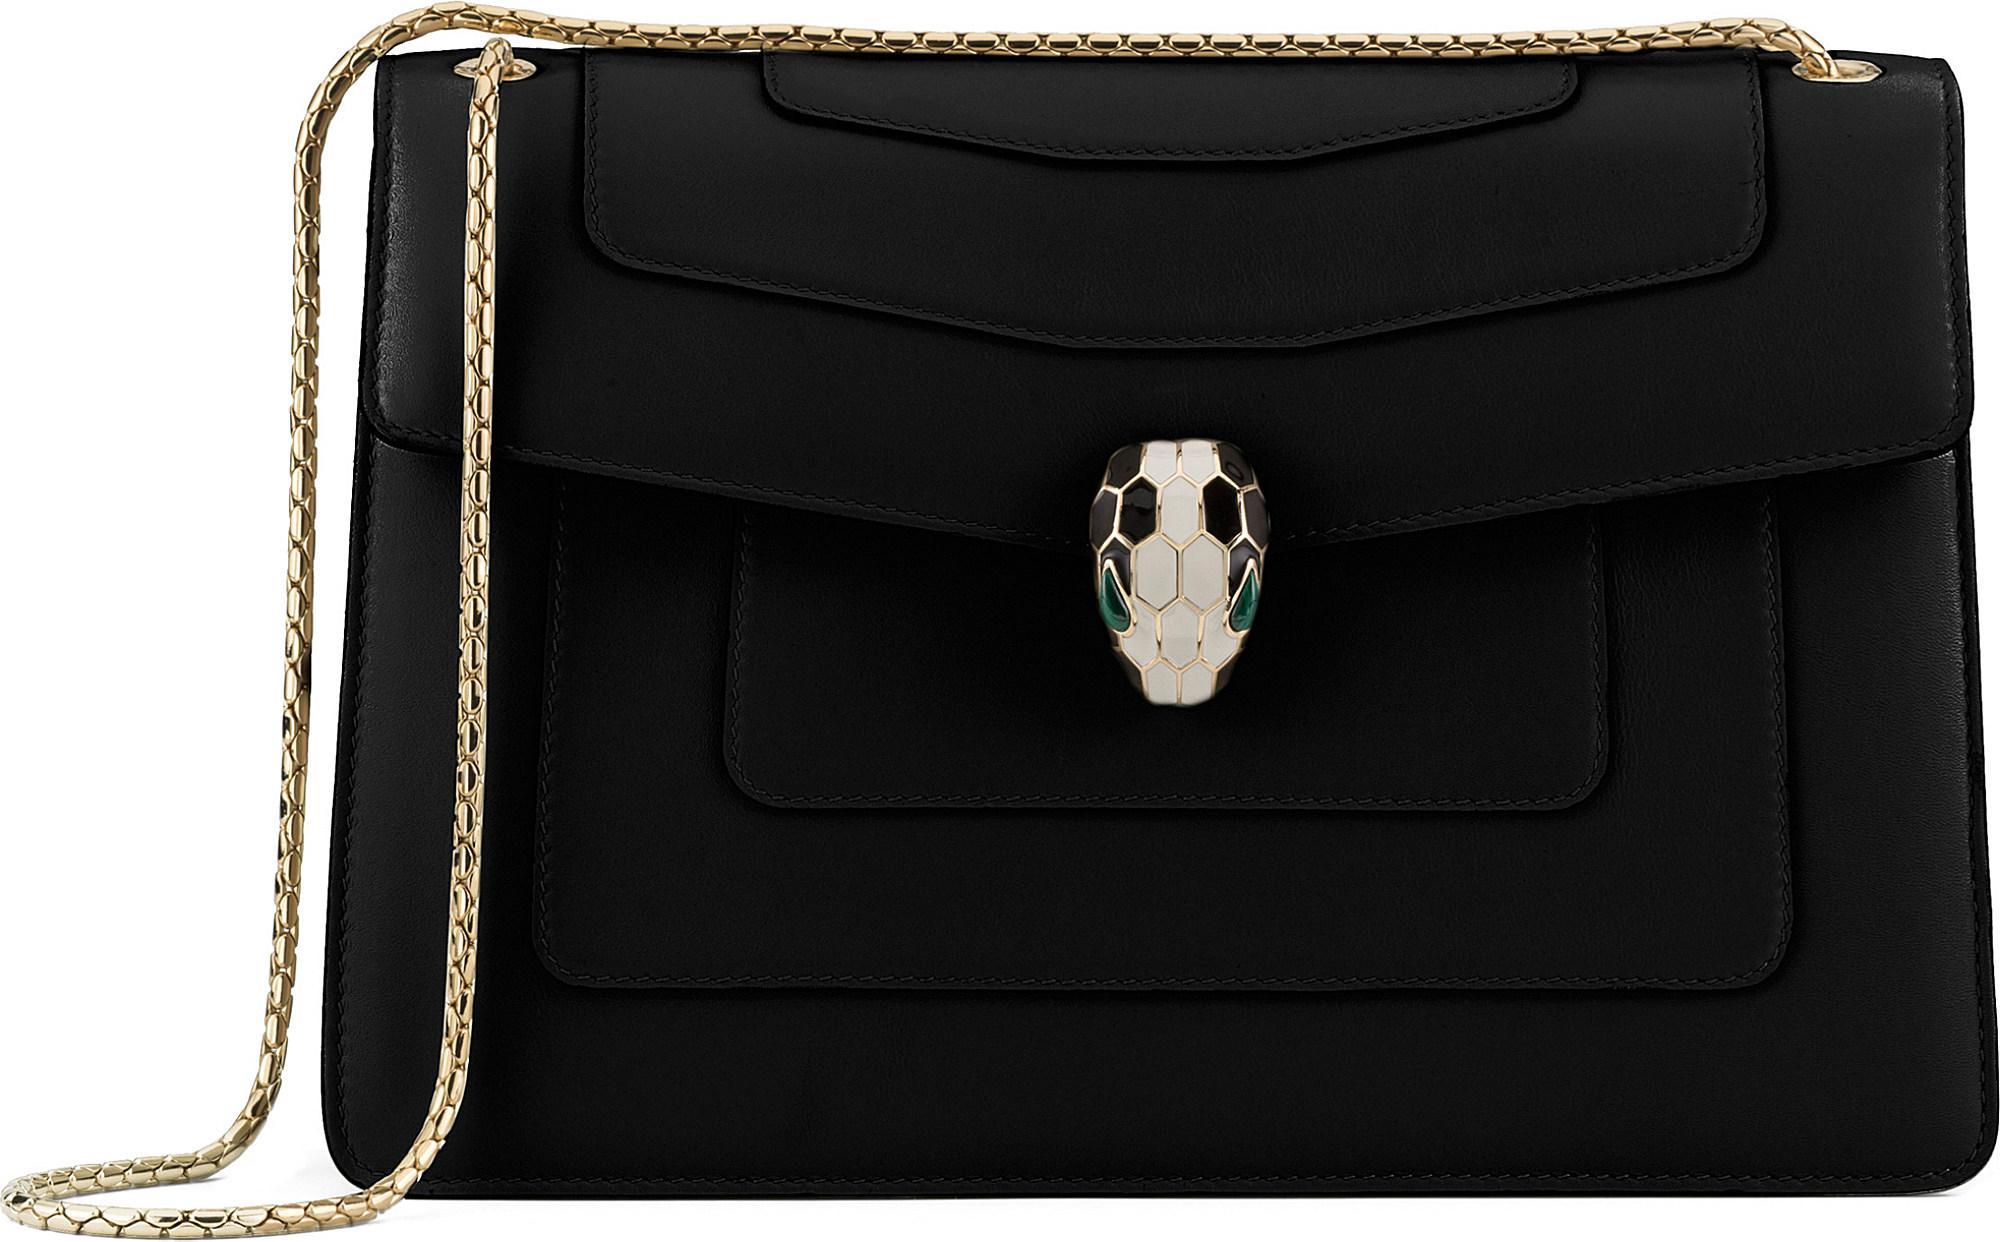 4d55f423ef24 BVLGARI Serpenti Forever Leather Shoulder Bag in Black - Lyst